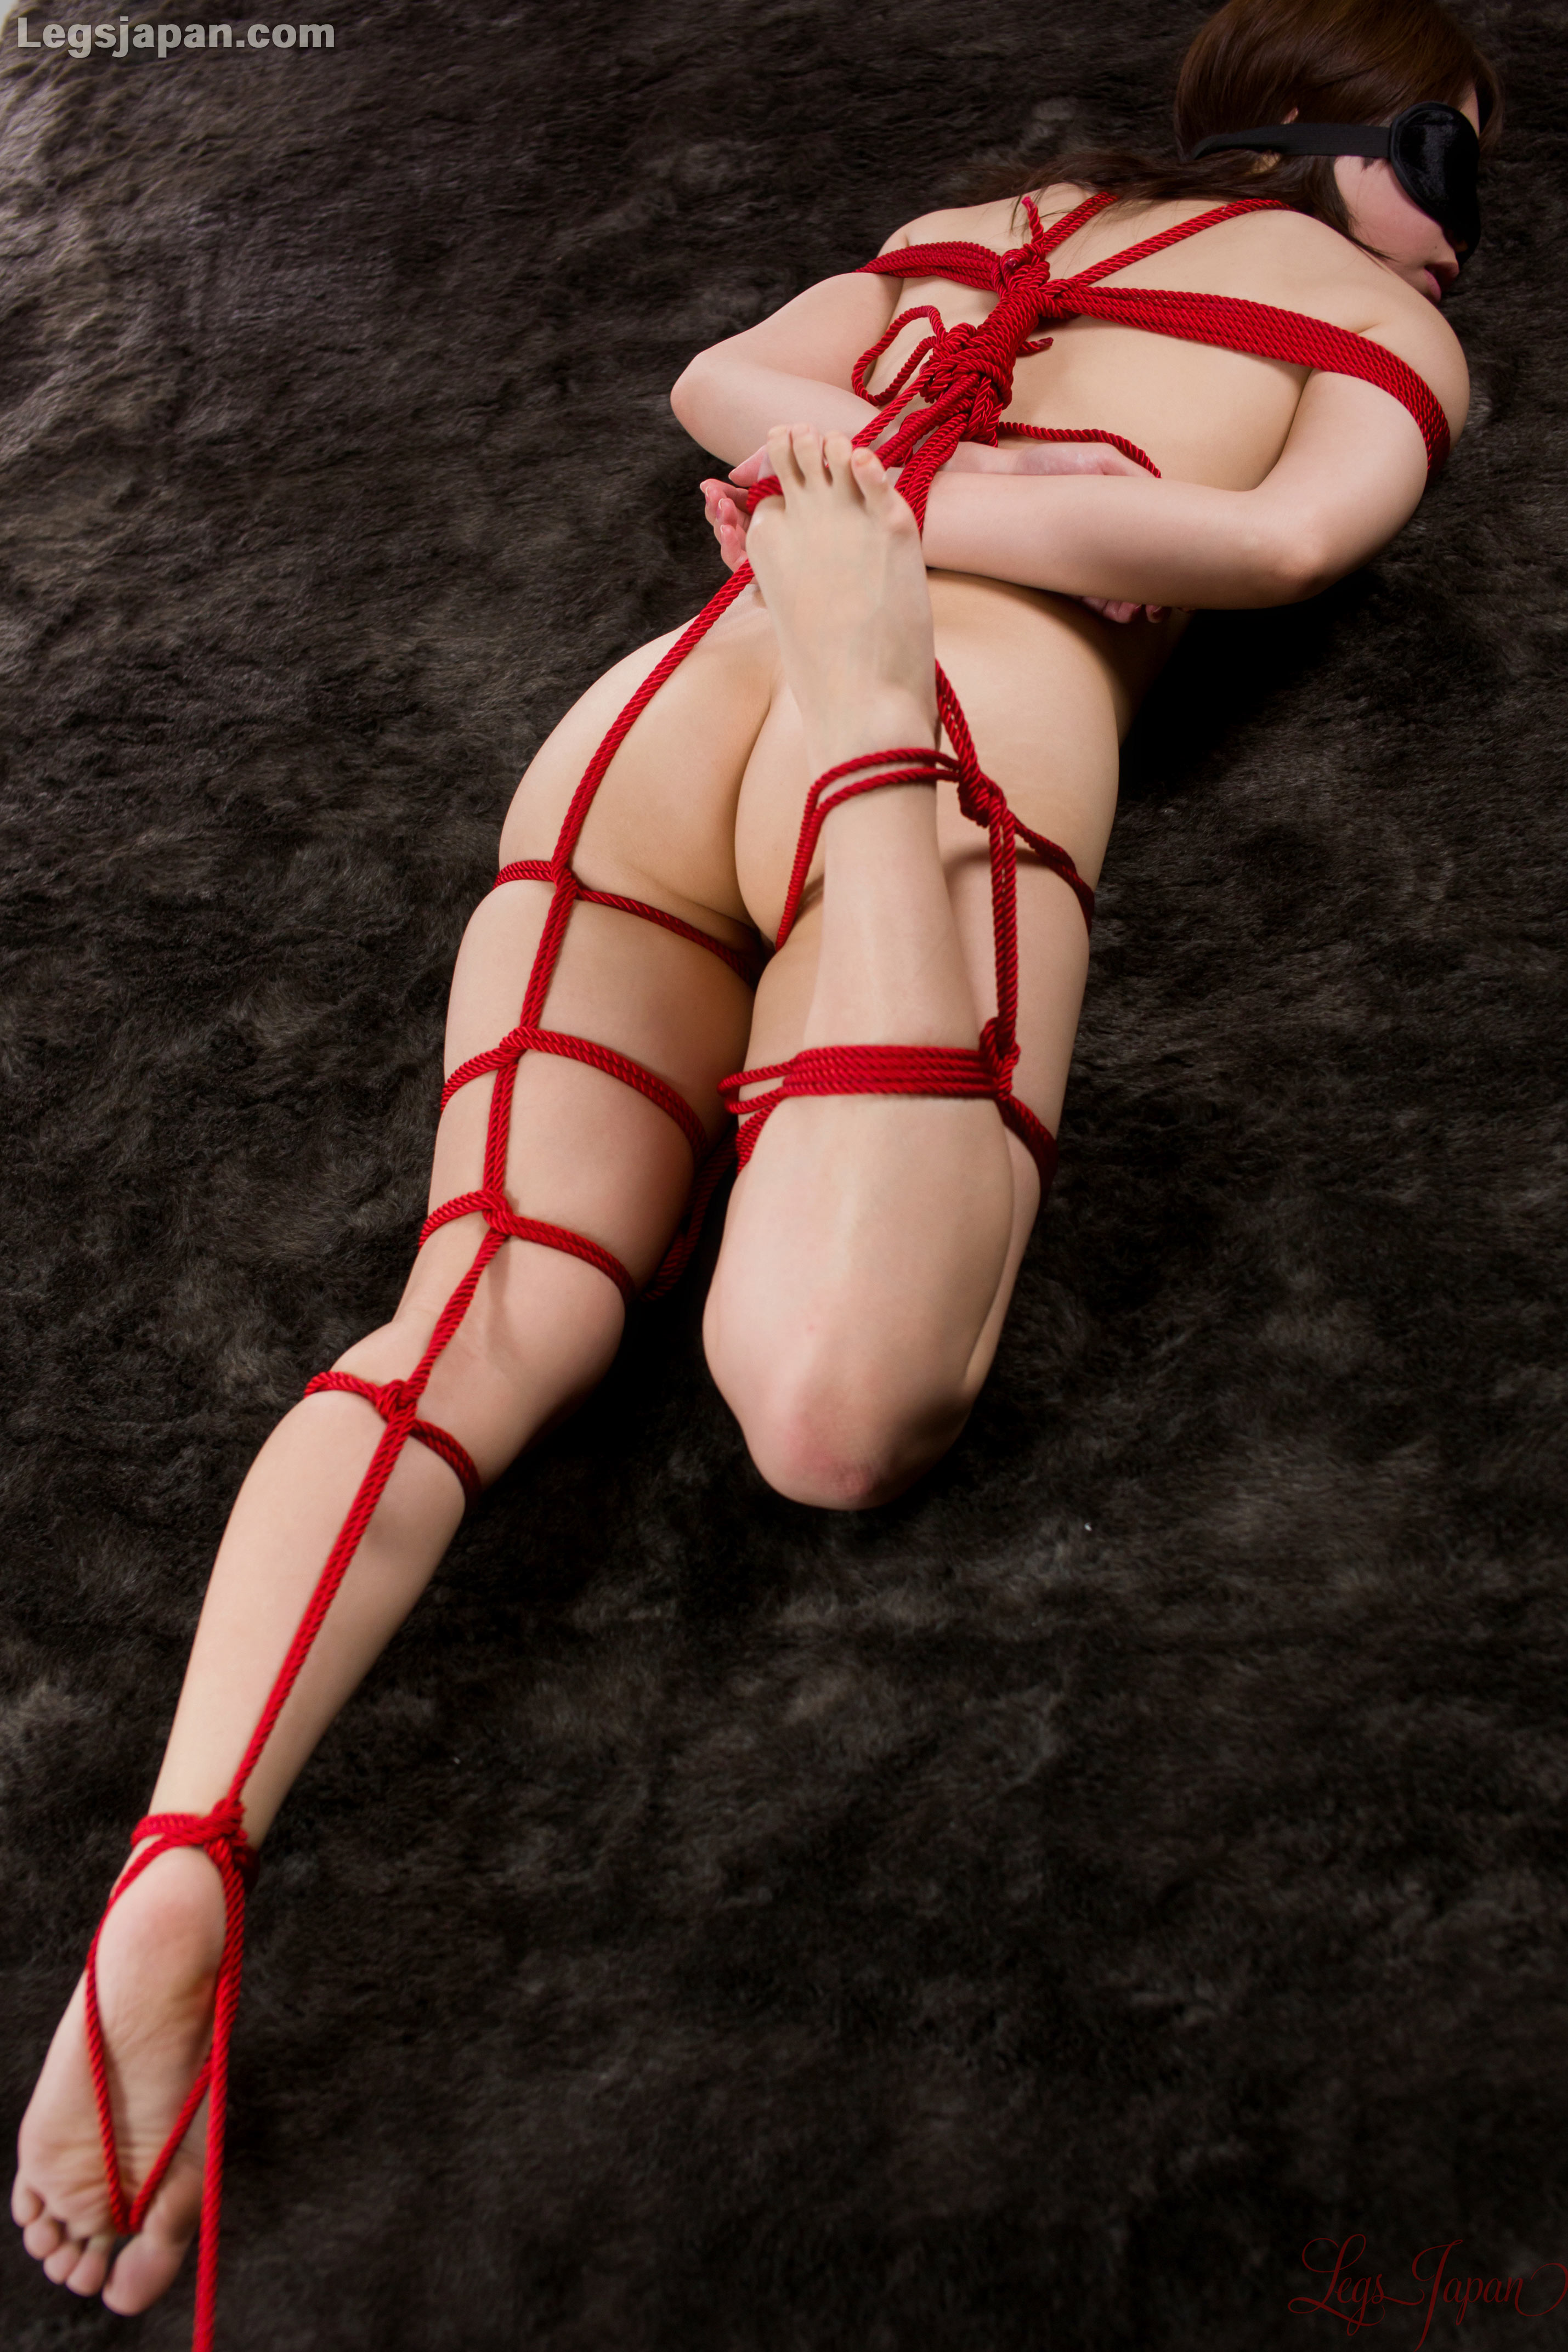 Naked Legs Video